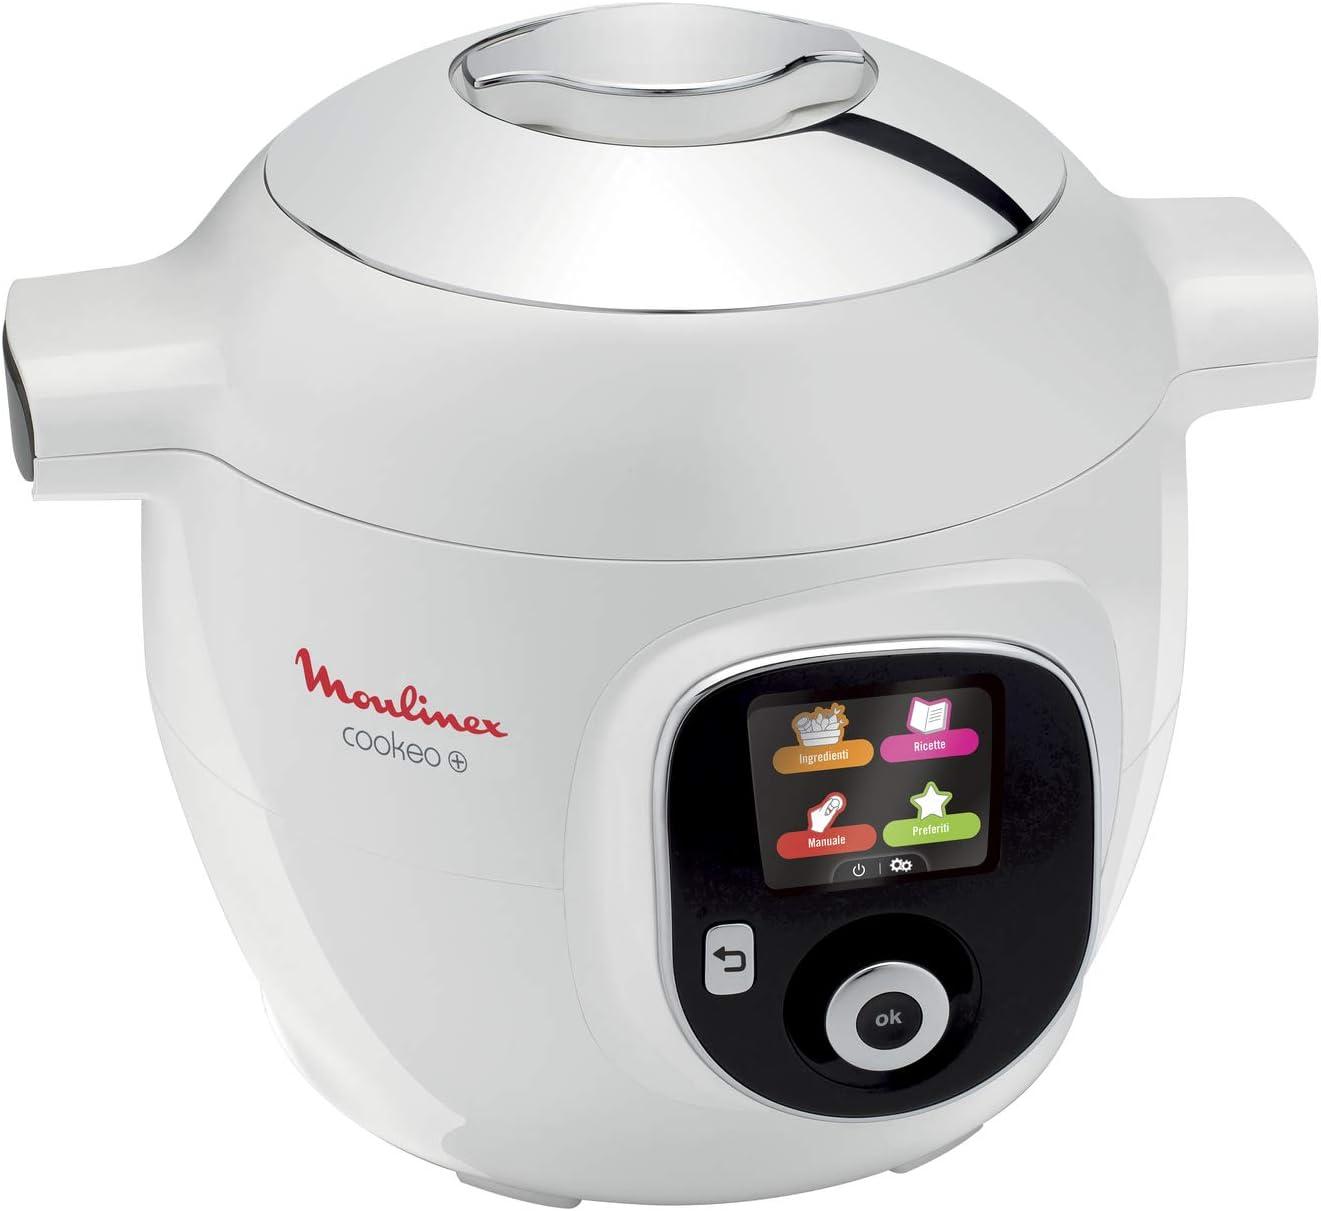 Moulinex Cookeo - Robot de cocina inteligente Cookeo +: Amazon.es: Hogar